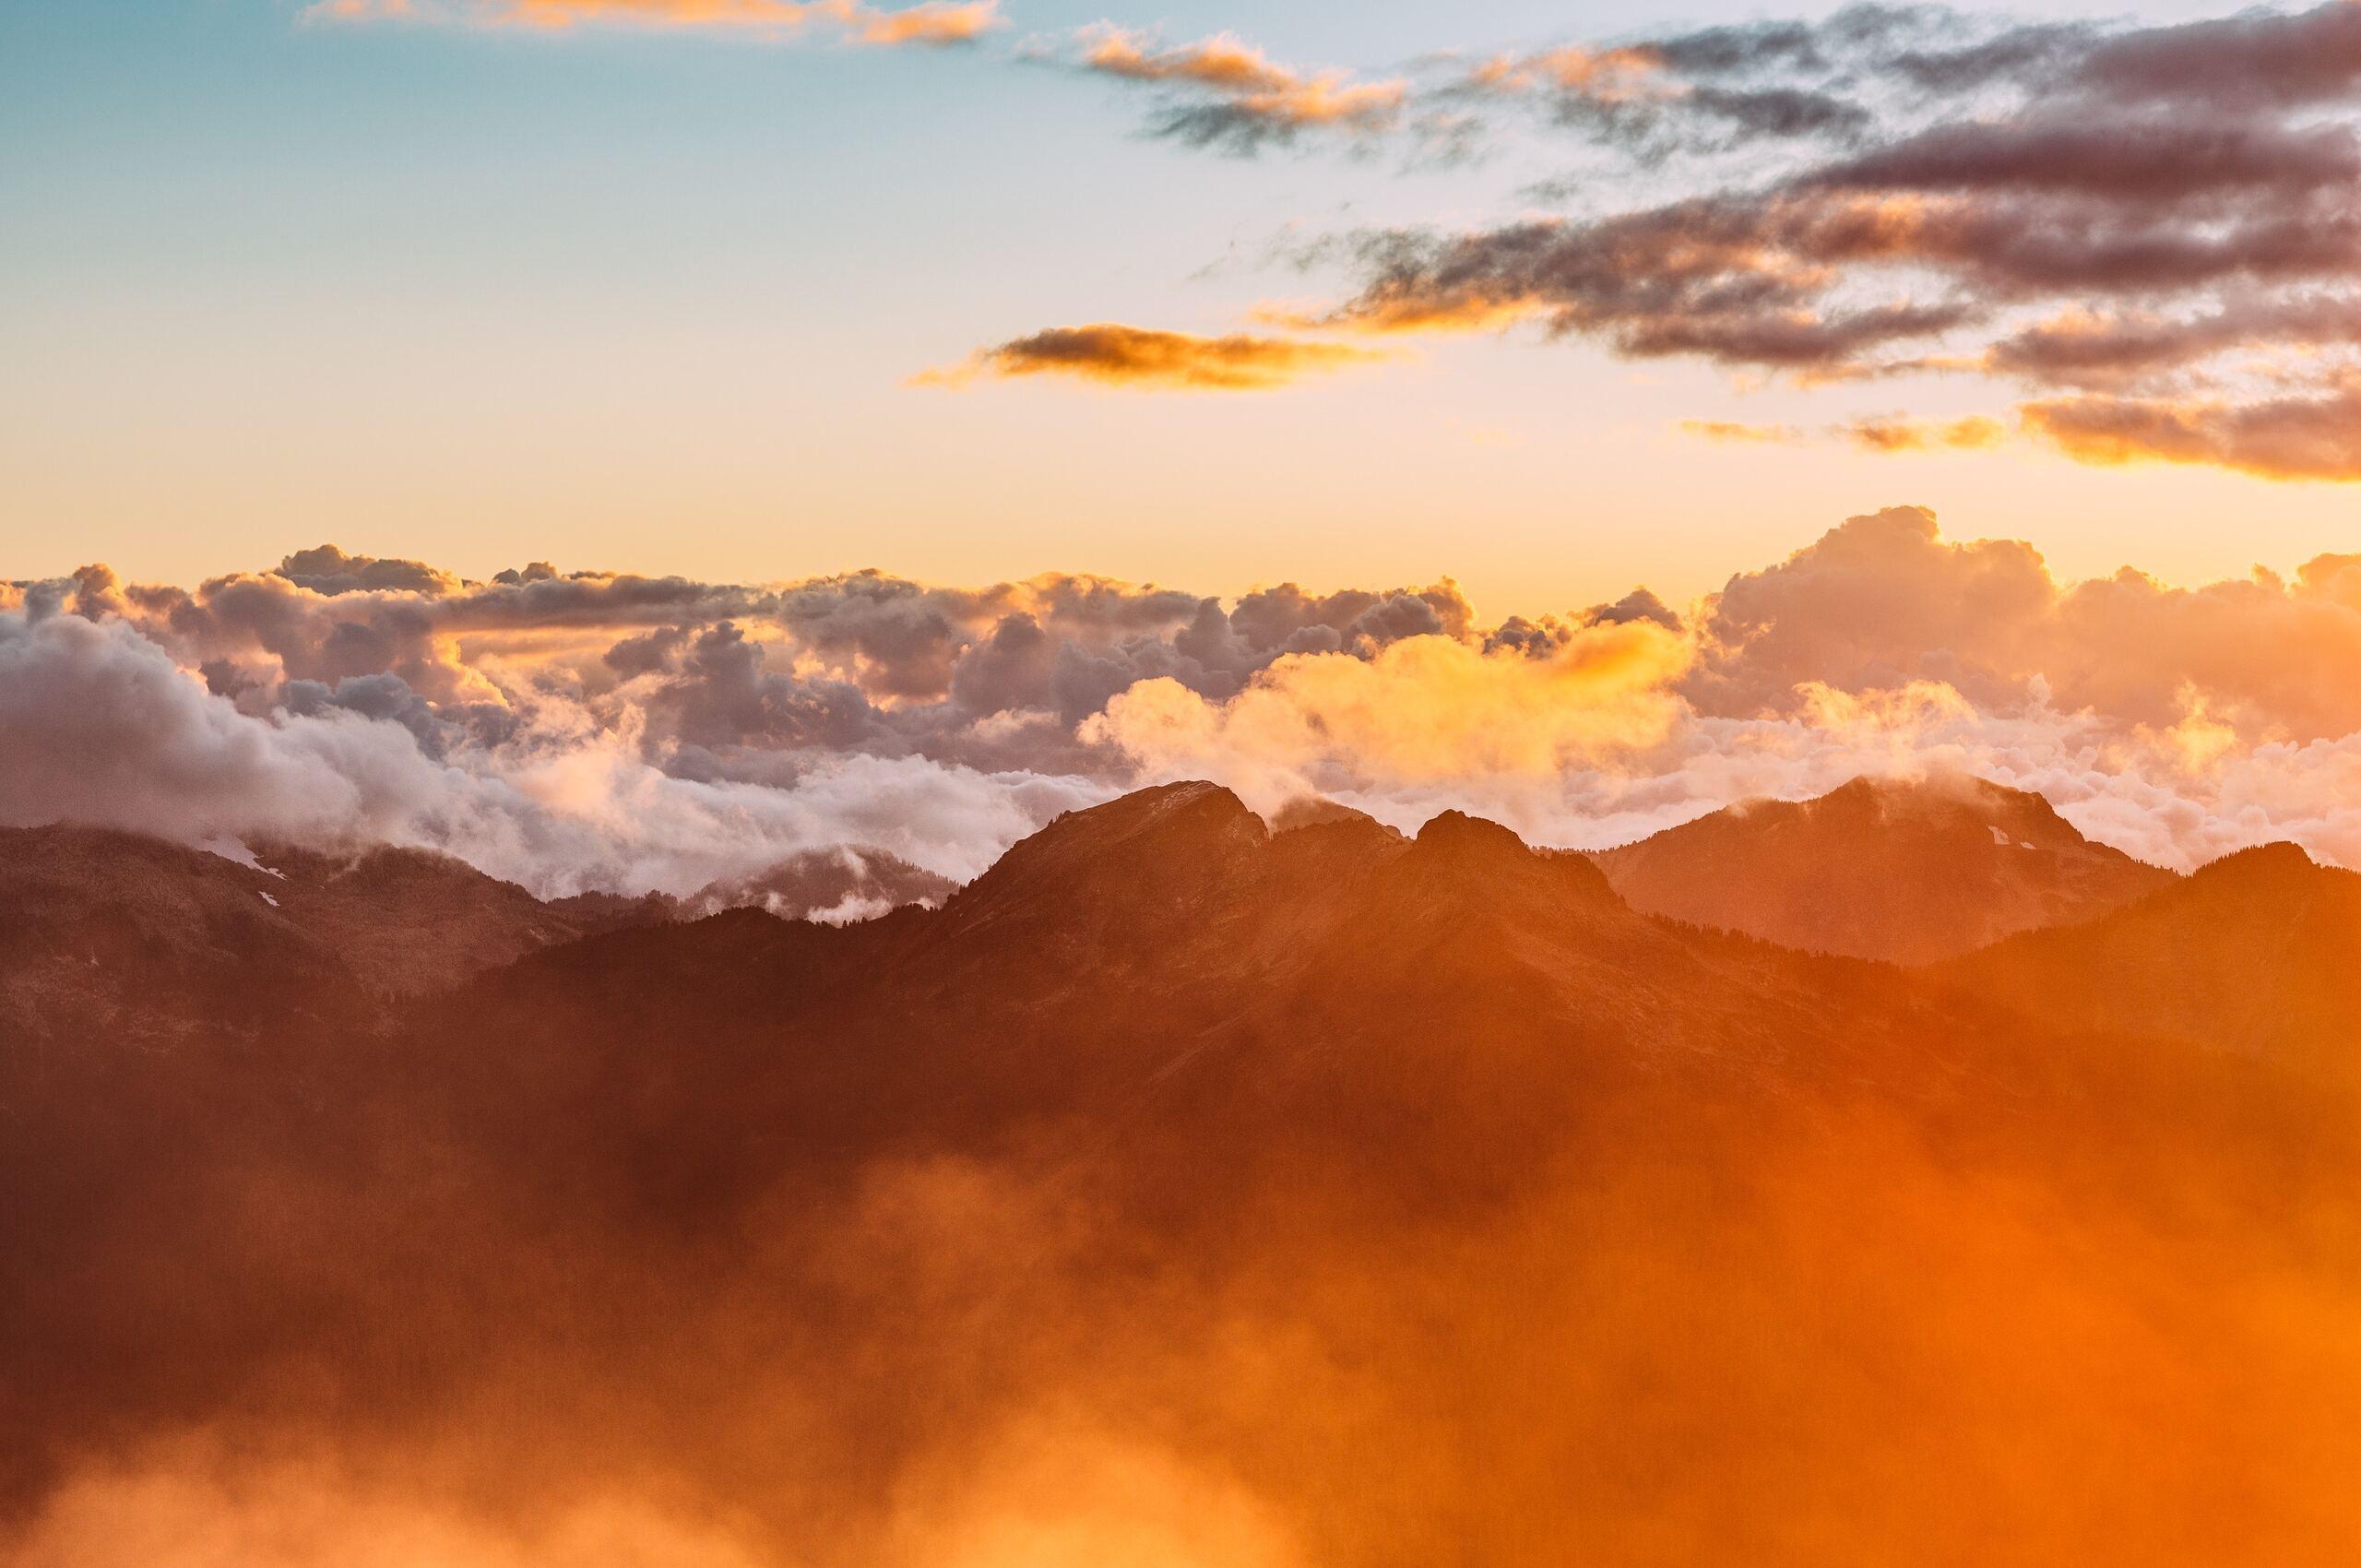 mountain-range-sea-of-clouds-m7.jpg